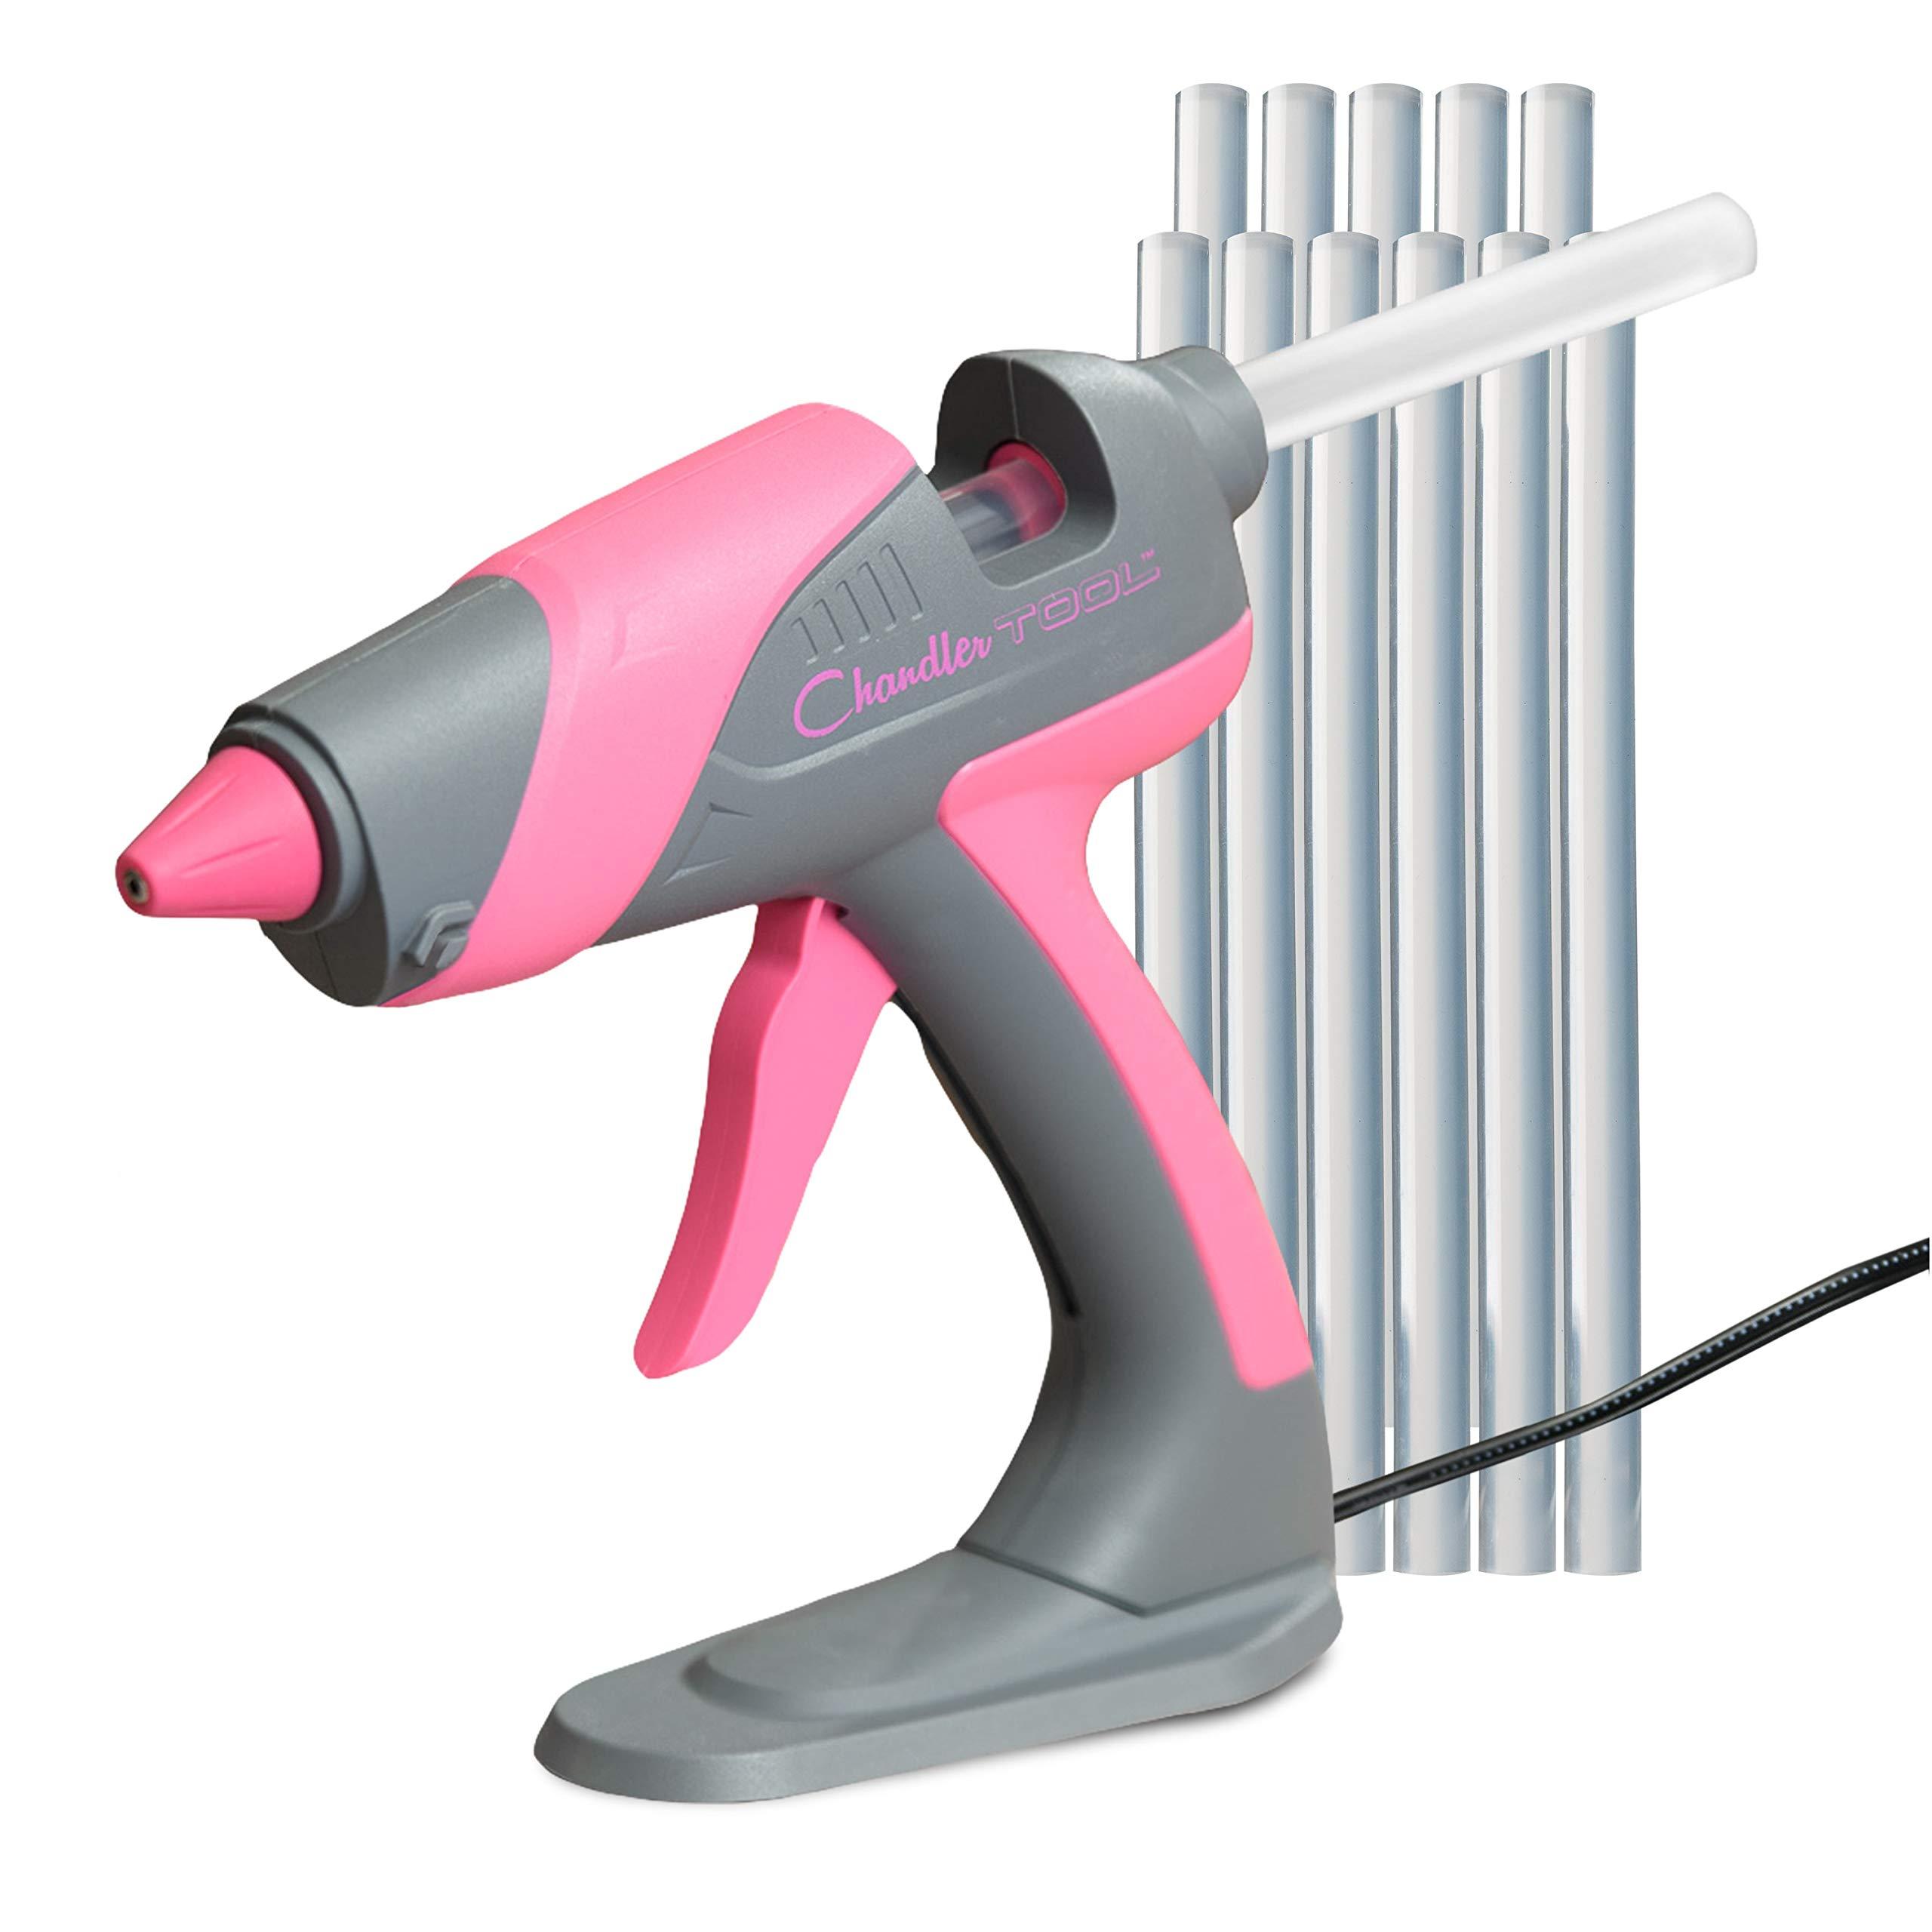 Chandler Tool Large Glue Gun - 60 Watt - Hot Glue Sticks & Patented Base Stand Included - for Arts Crafts School Home Repair DIY (Pink)